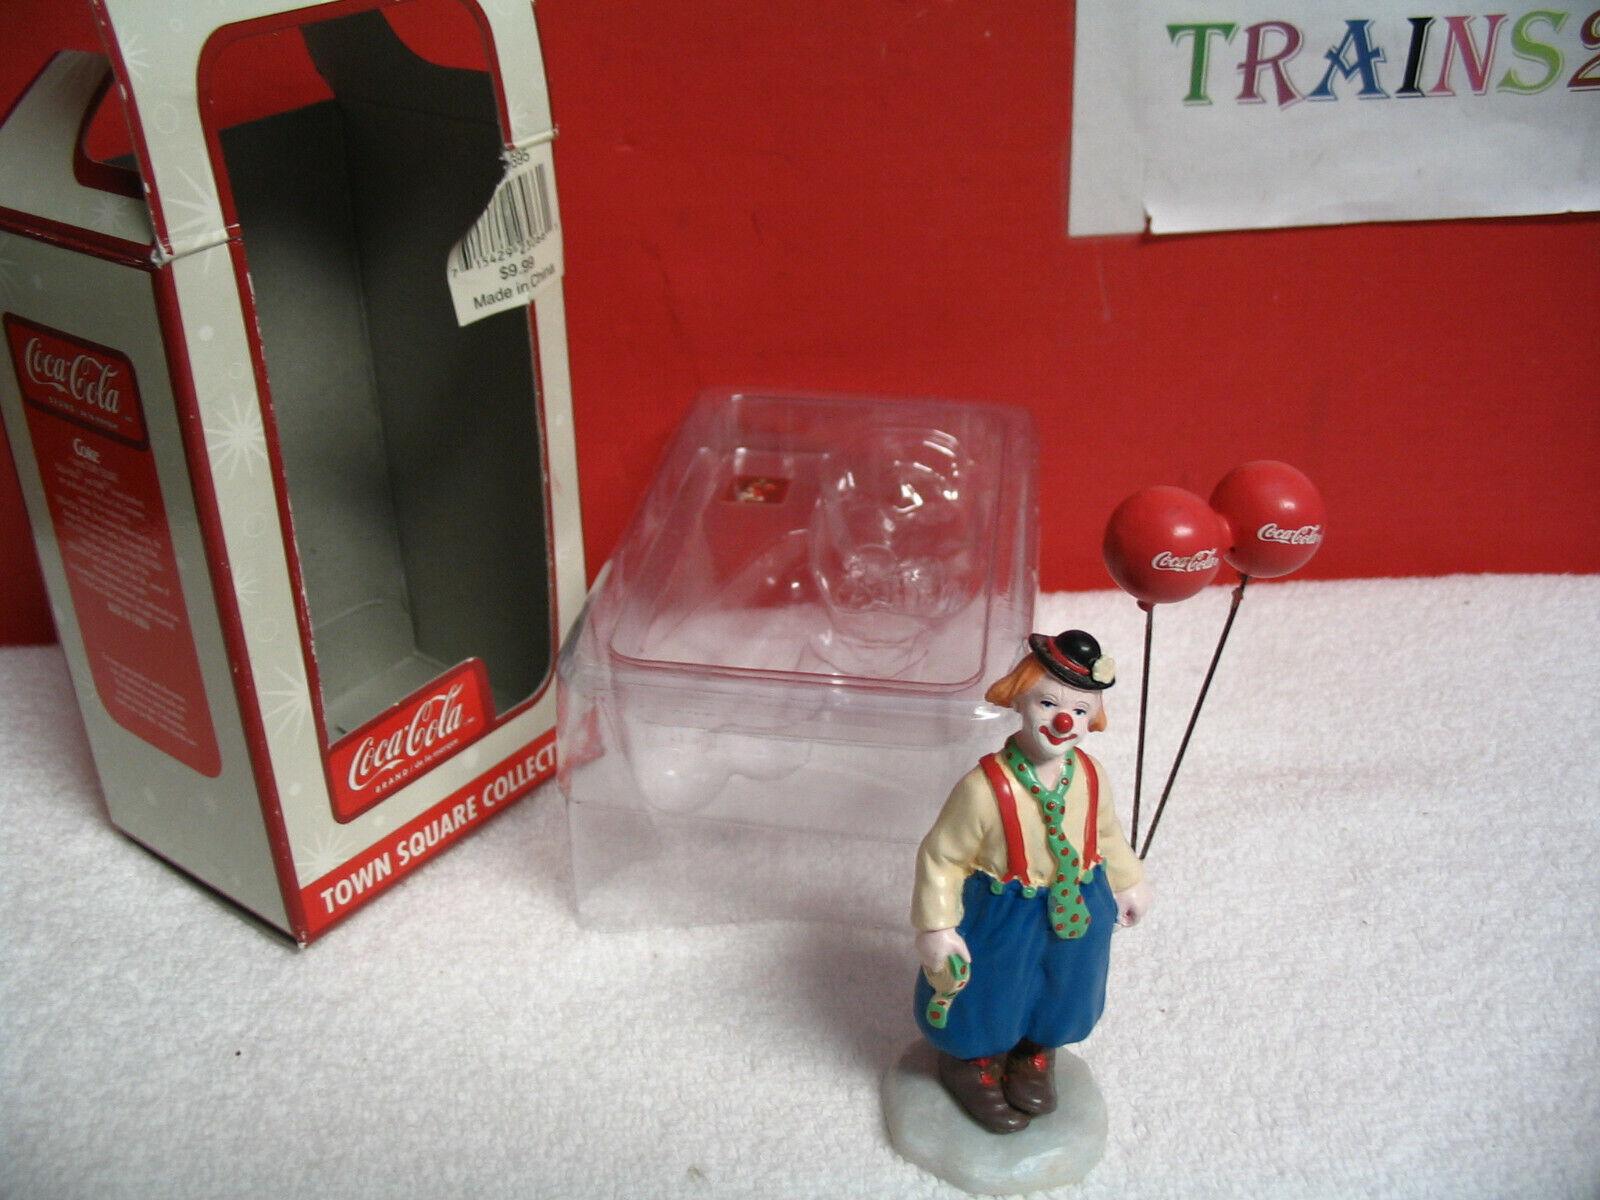 Купить Coca Cola Town Square Accessory Clown With Balloons 2003